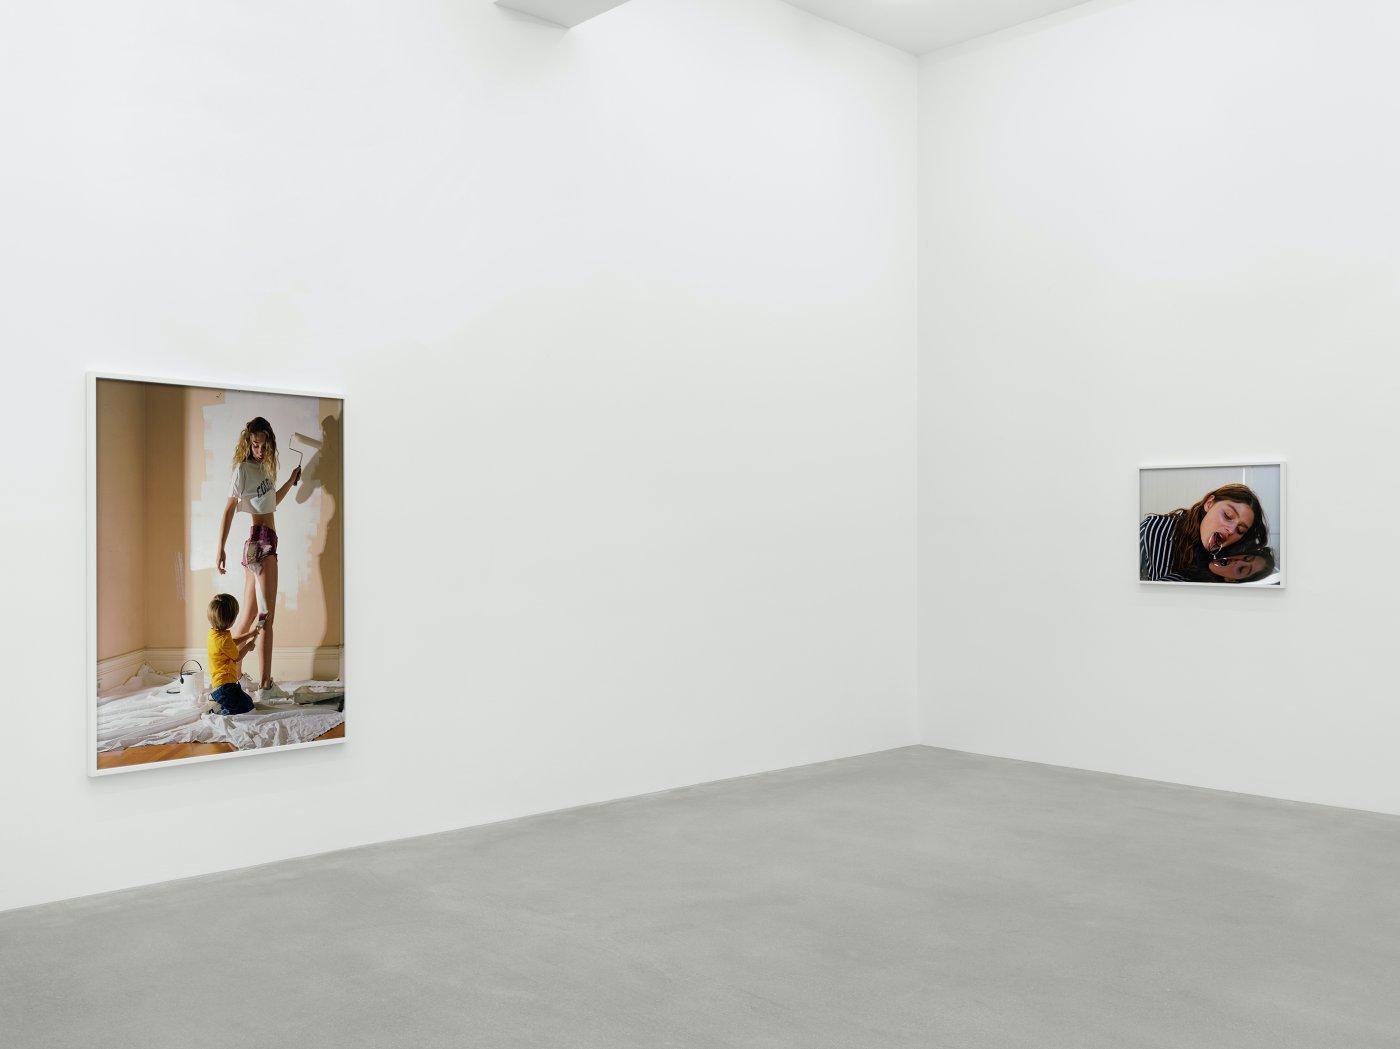 Galerie Eva Presenhuber Waldmanstrasse Torbjorn Rodland 5